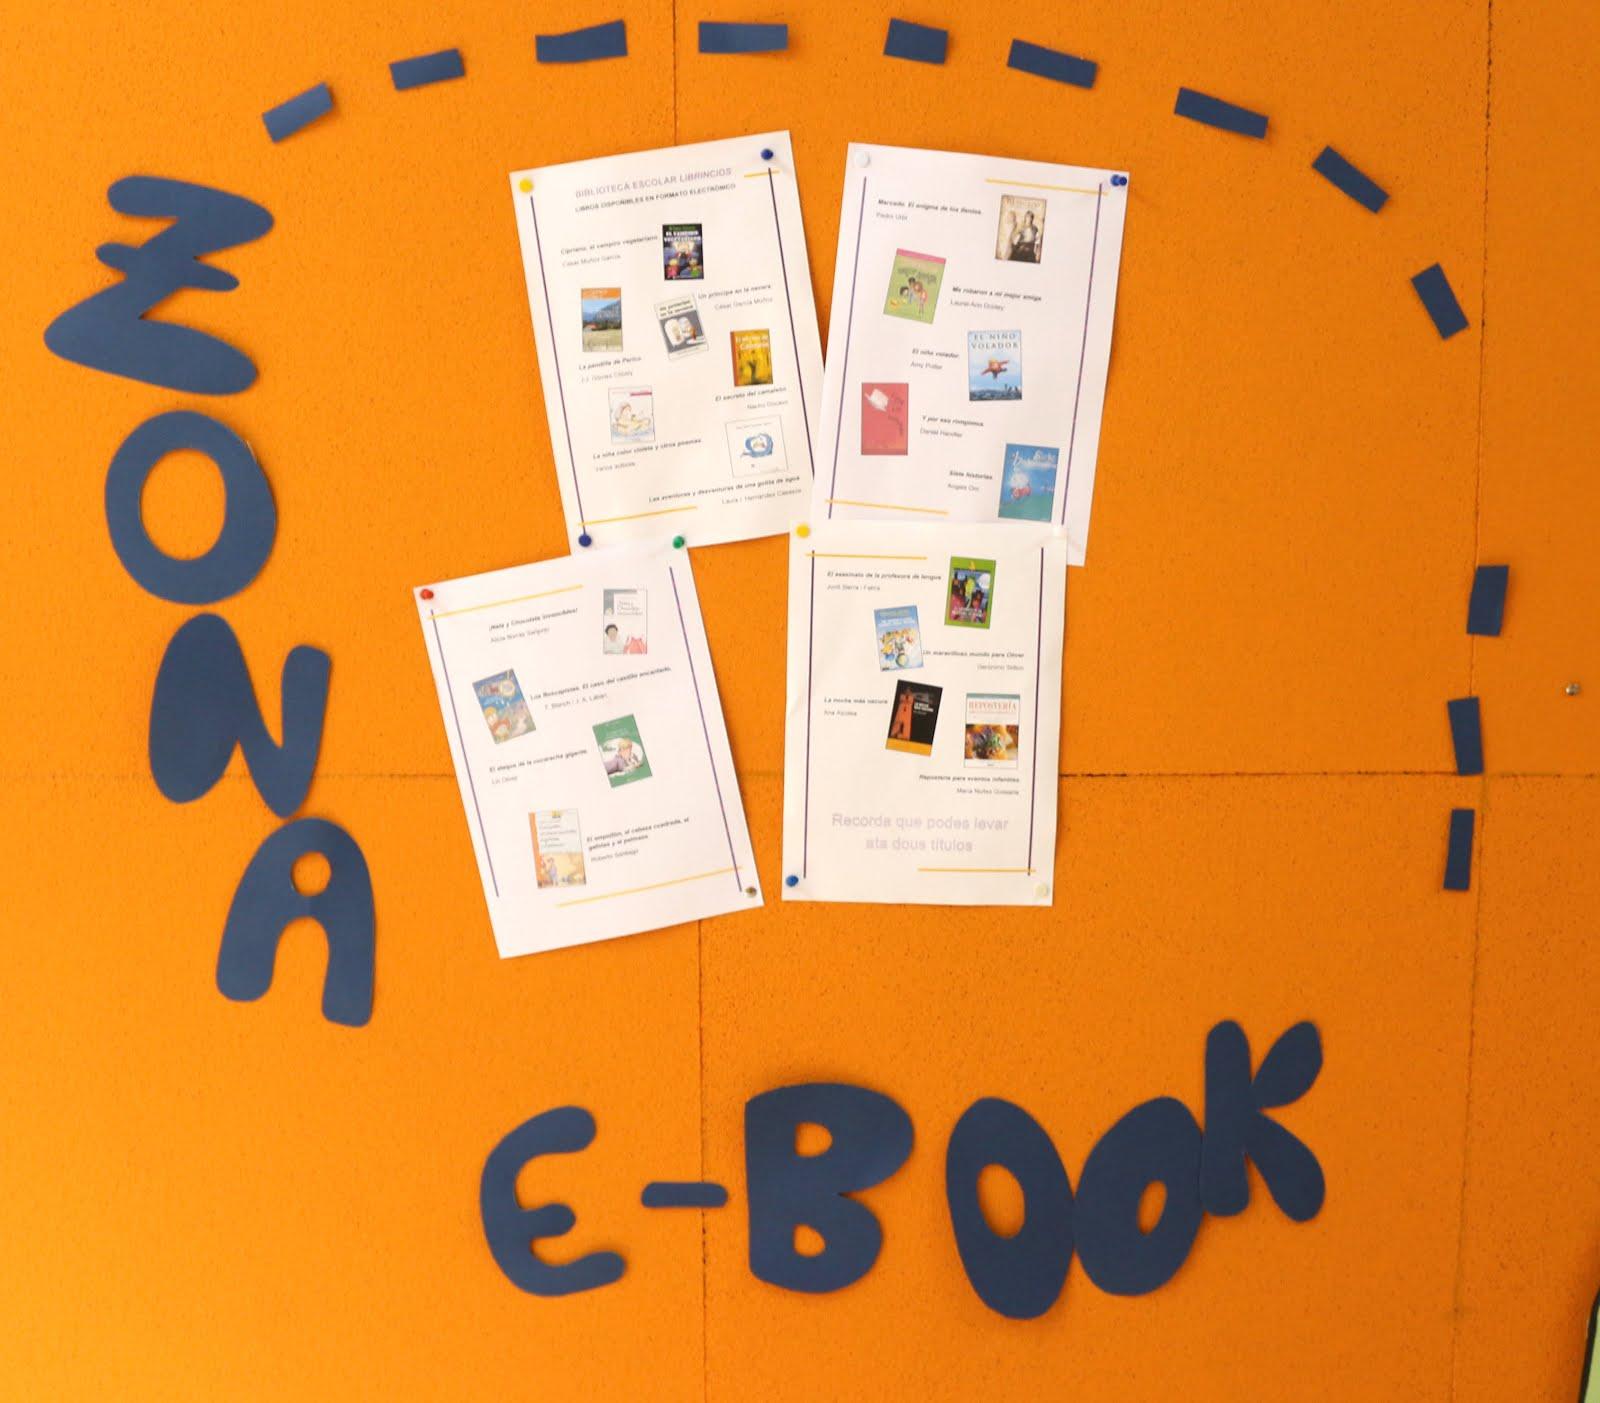 ZONA E-BOOK